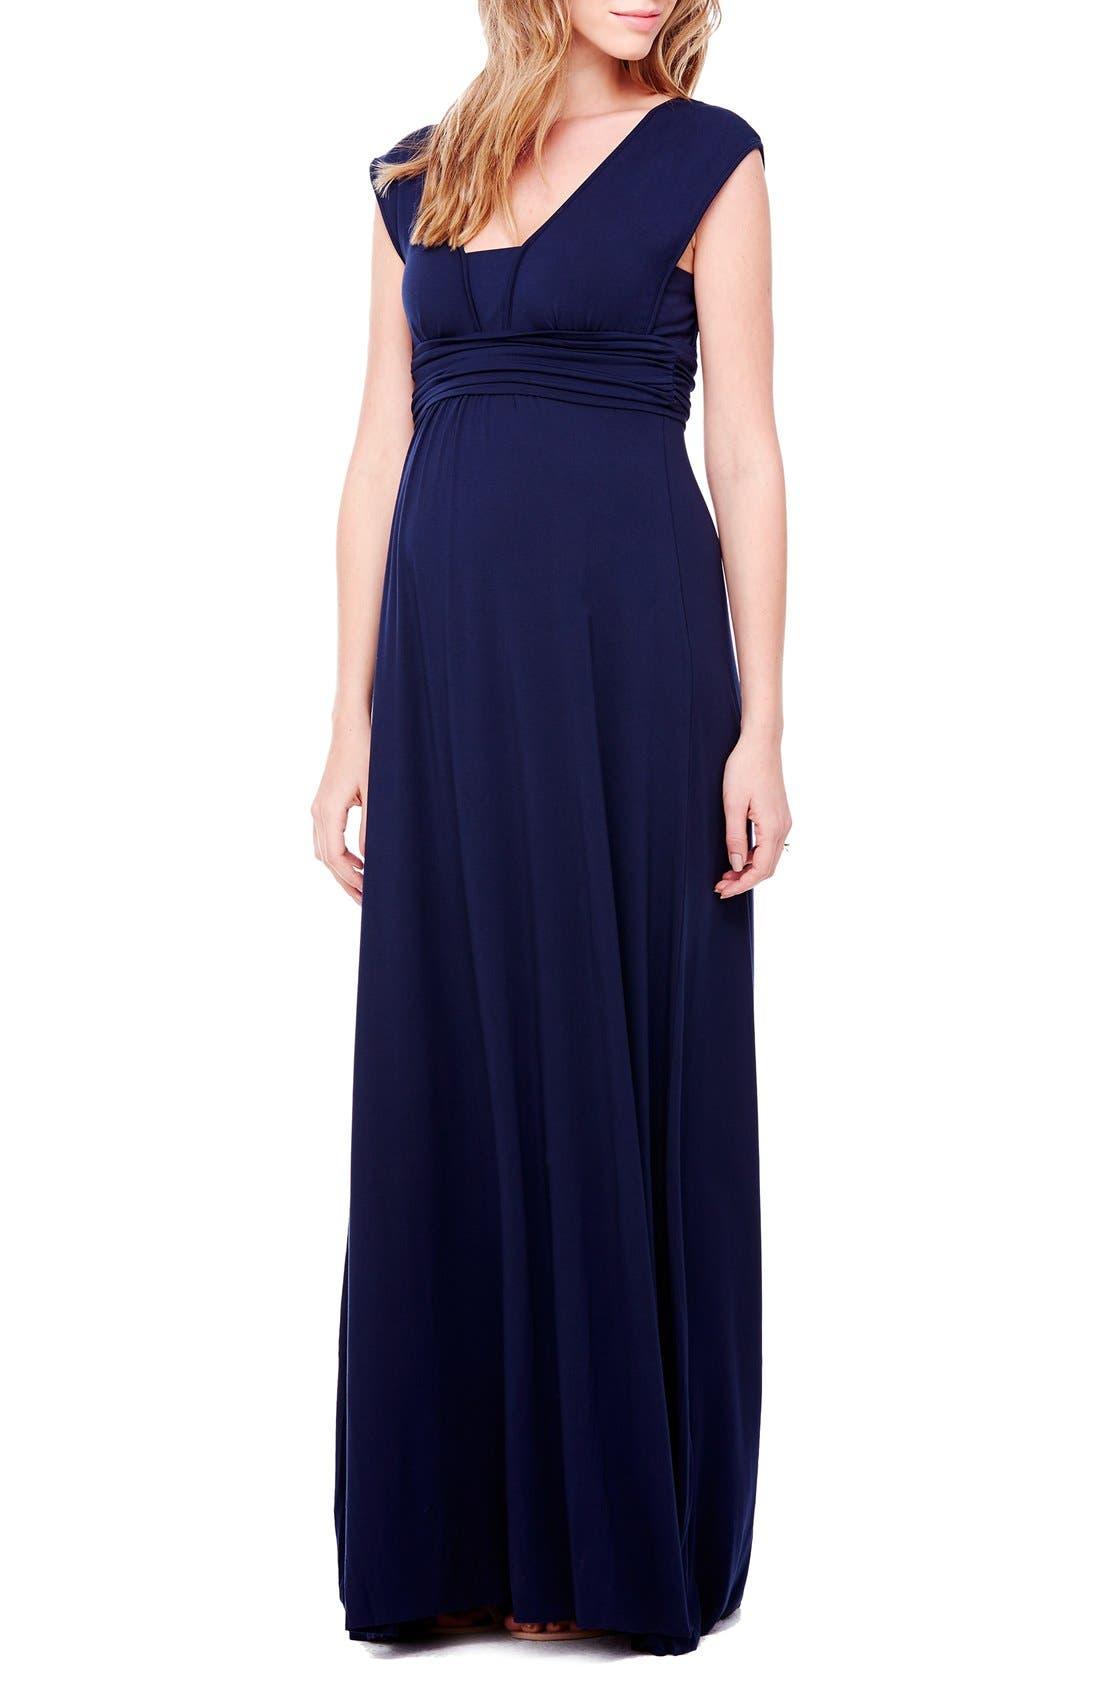 Empire Waist Maternity Maxi Dress,                             Main thumbnail 2, color,